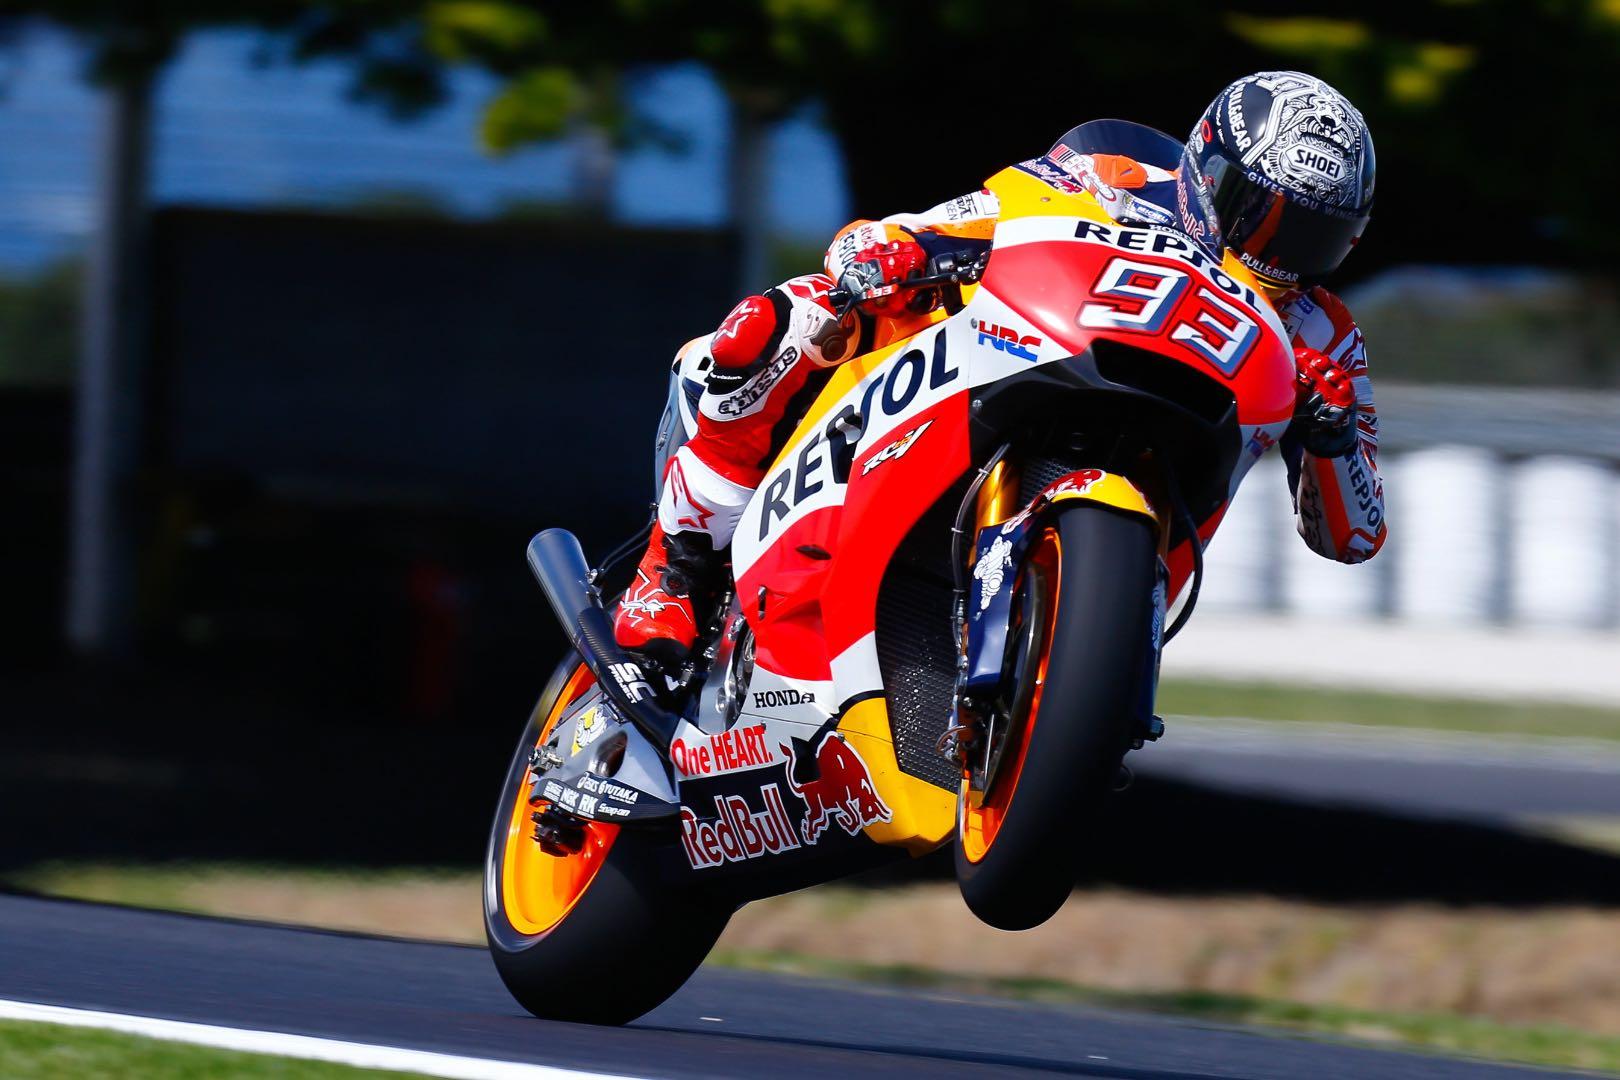 Marc Marquez Renews Repsol Honda MotoGP Contract Through 2020